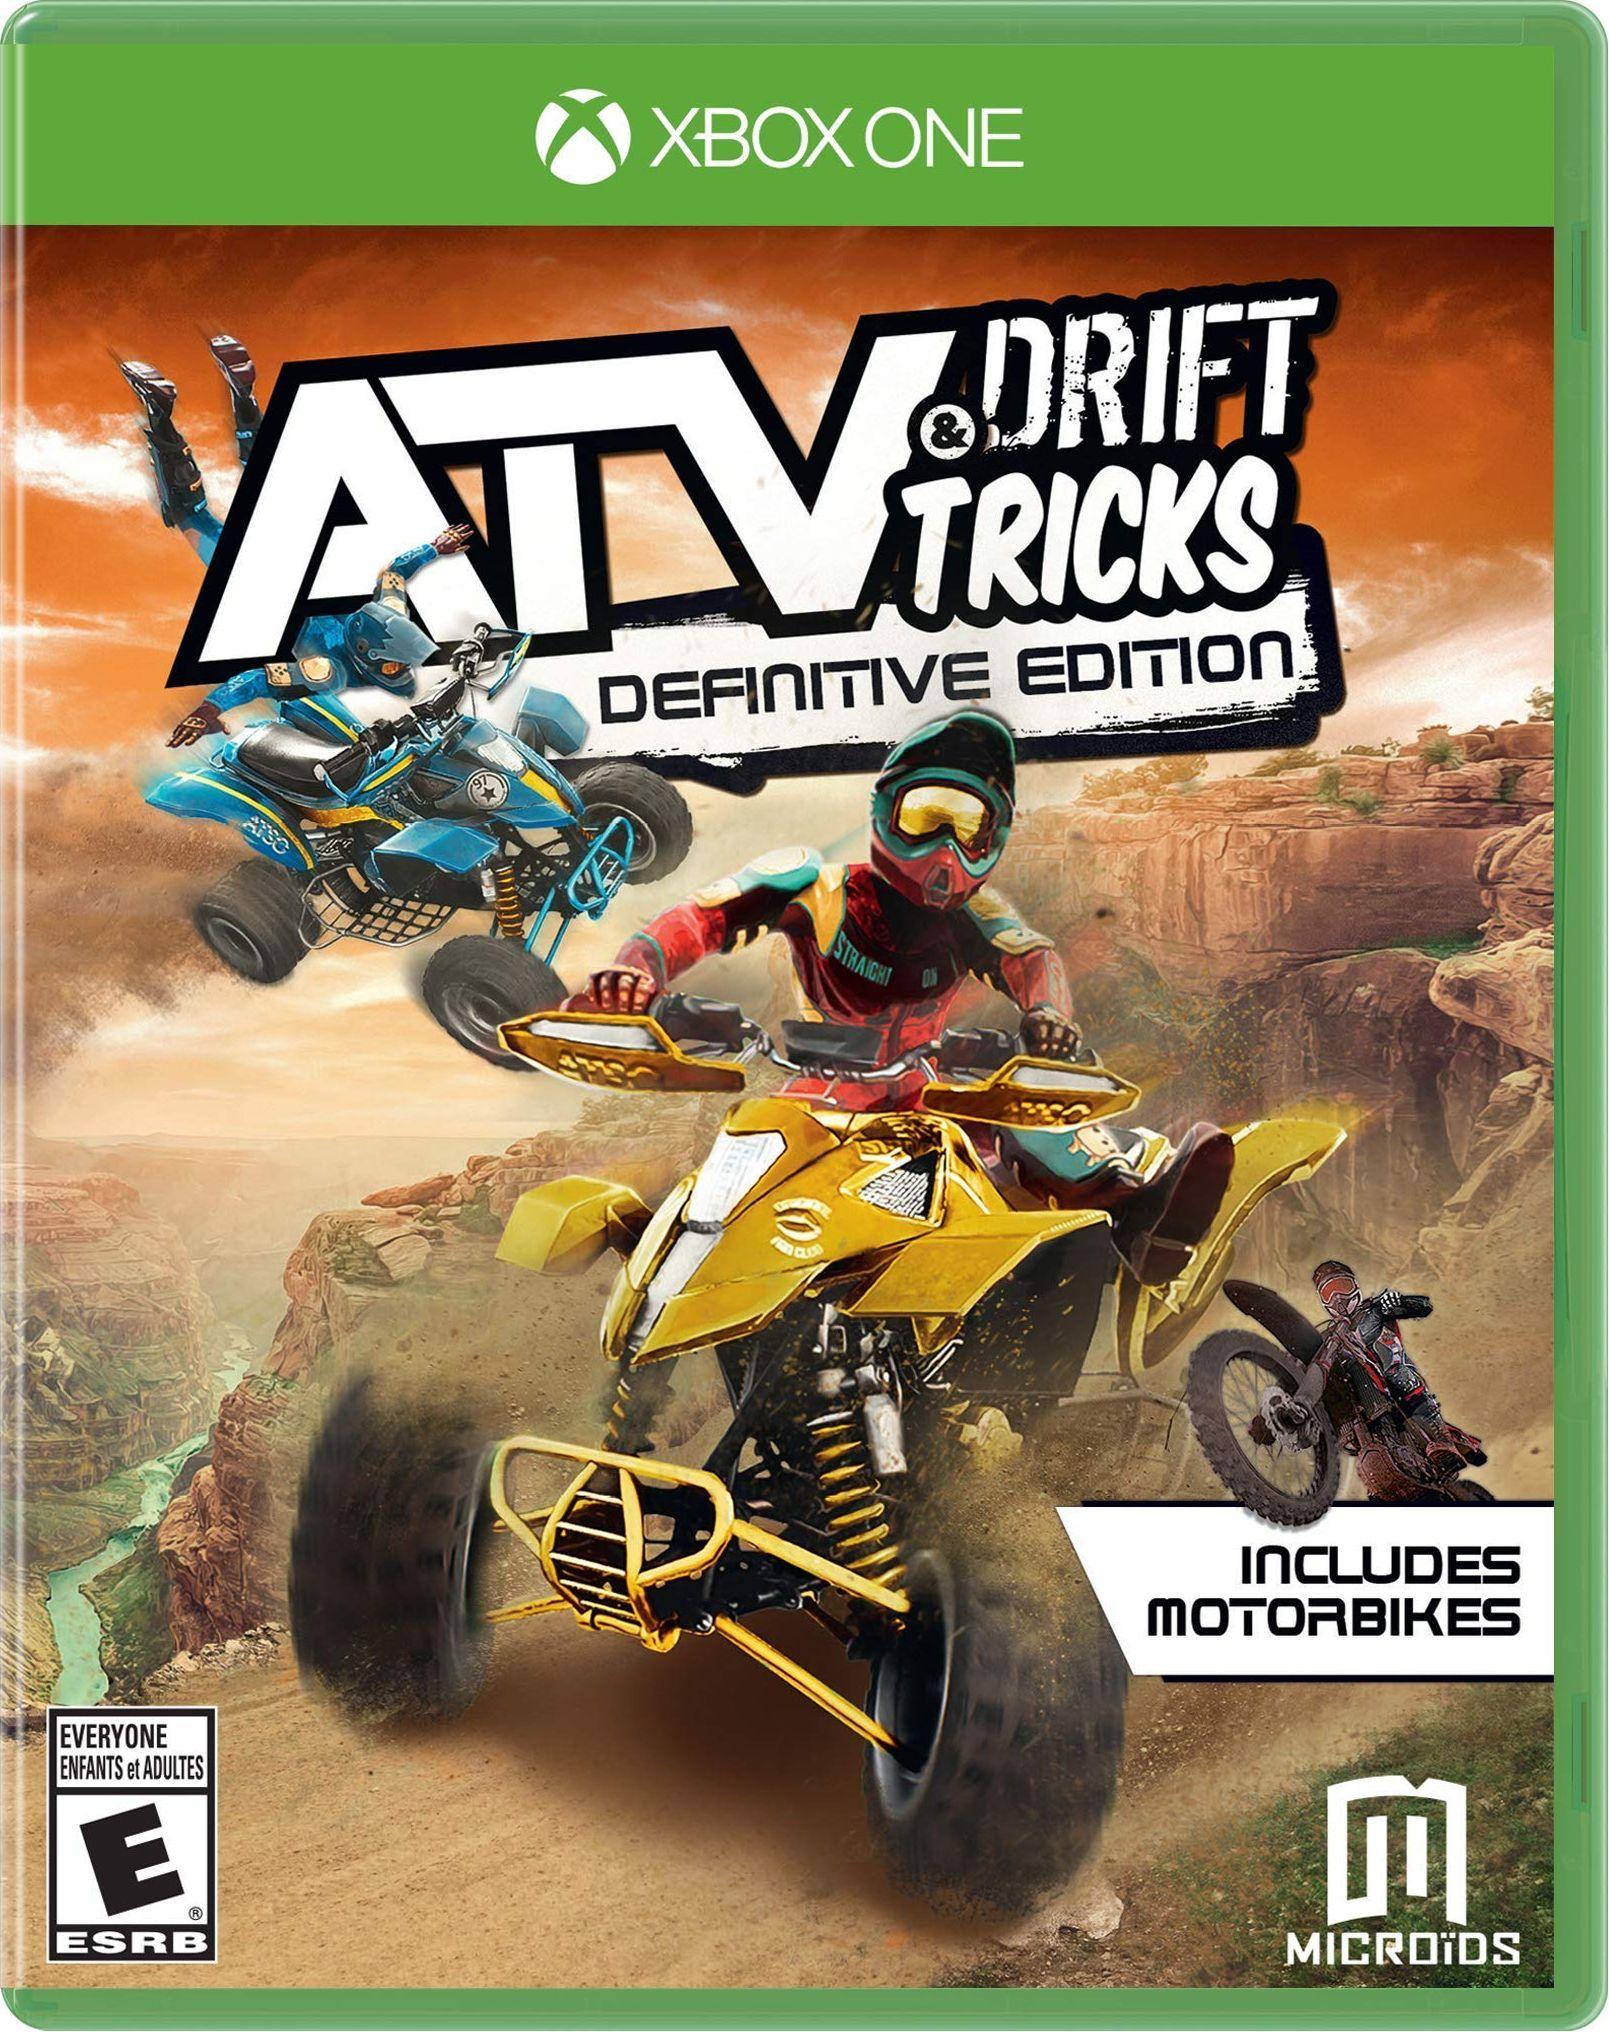 ATV Drift & Tricks Definitive Edition (download) @ Xbox Store